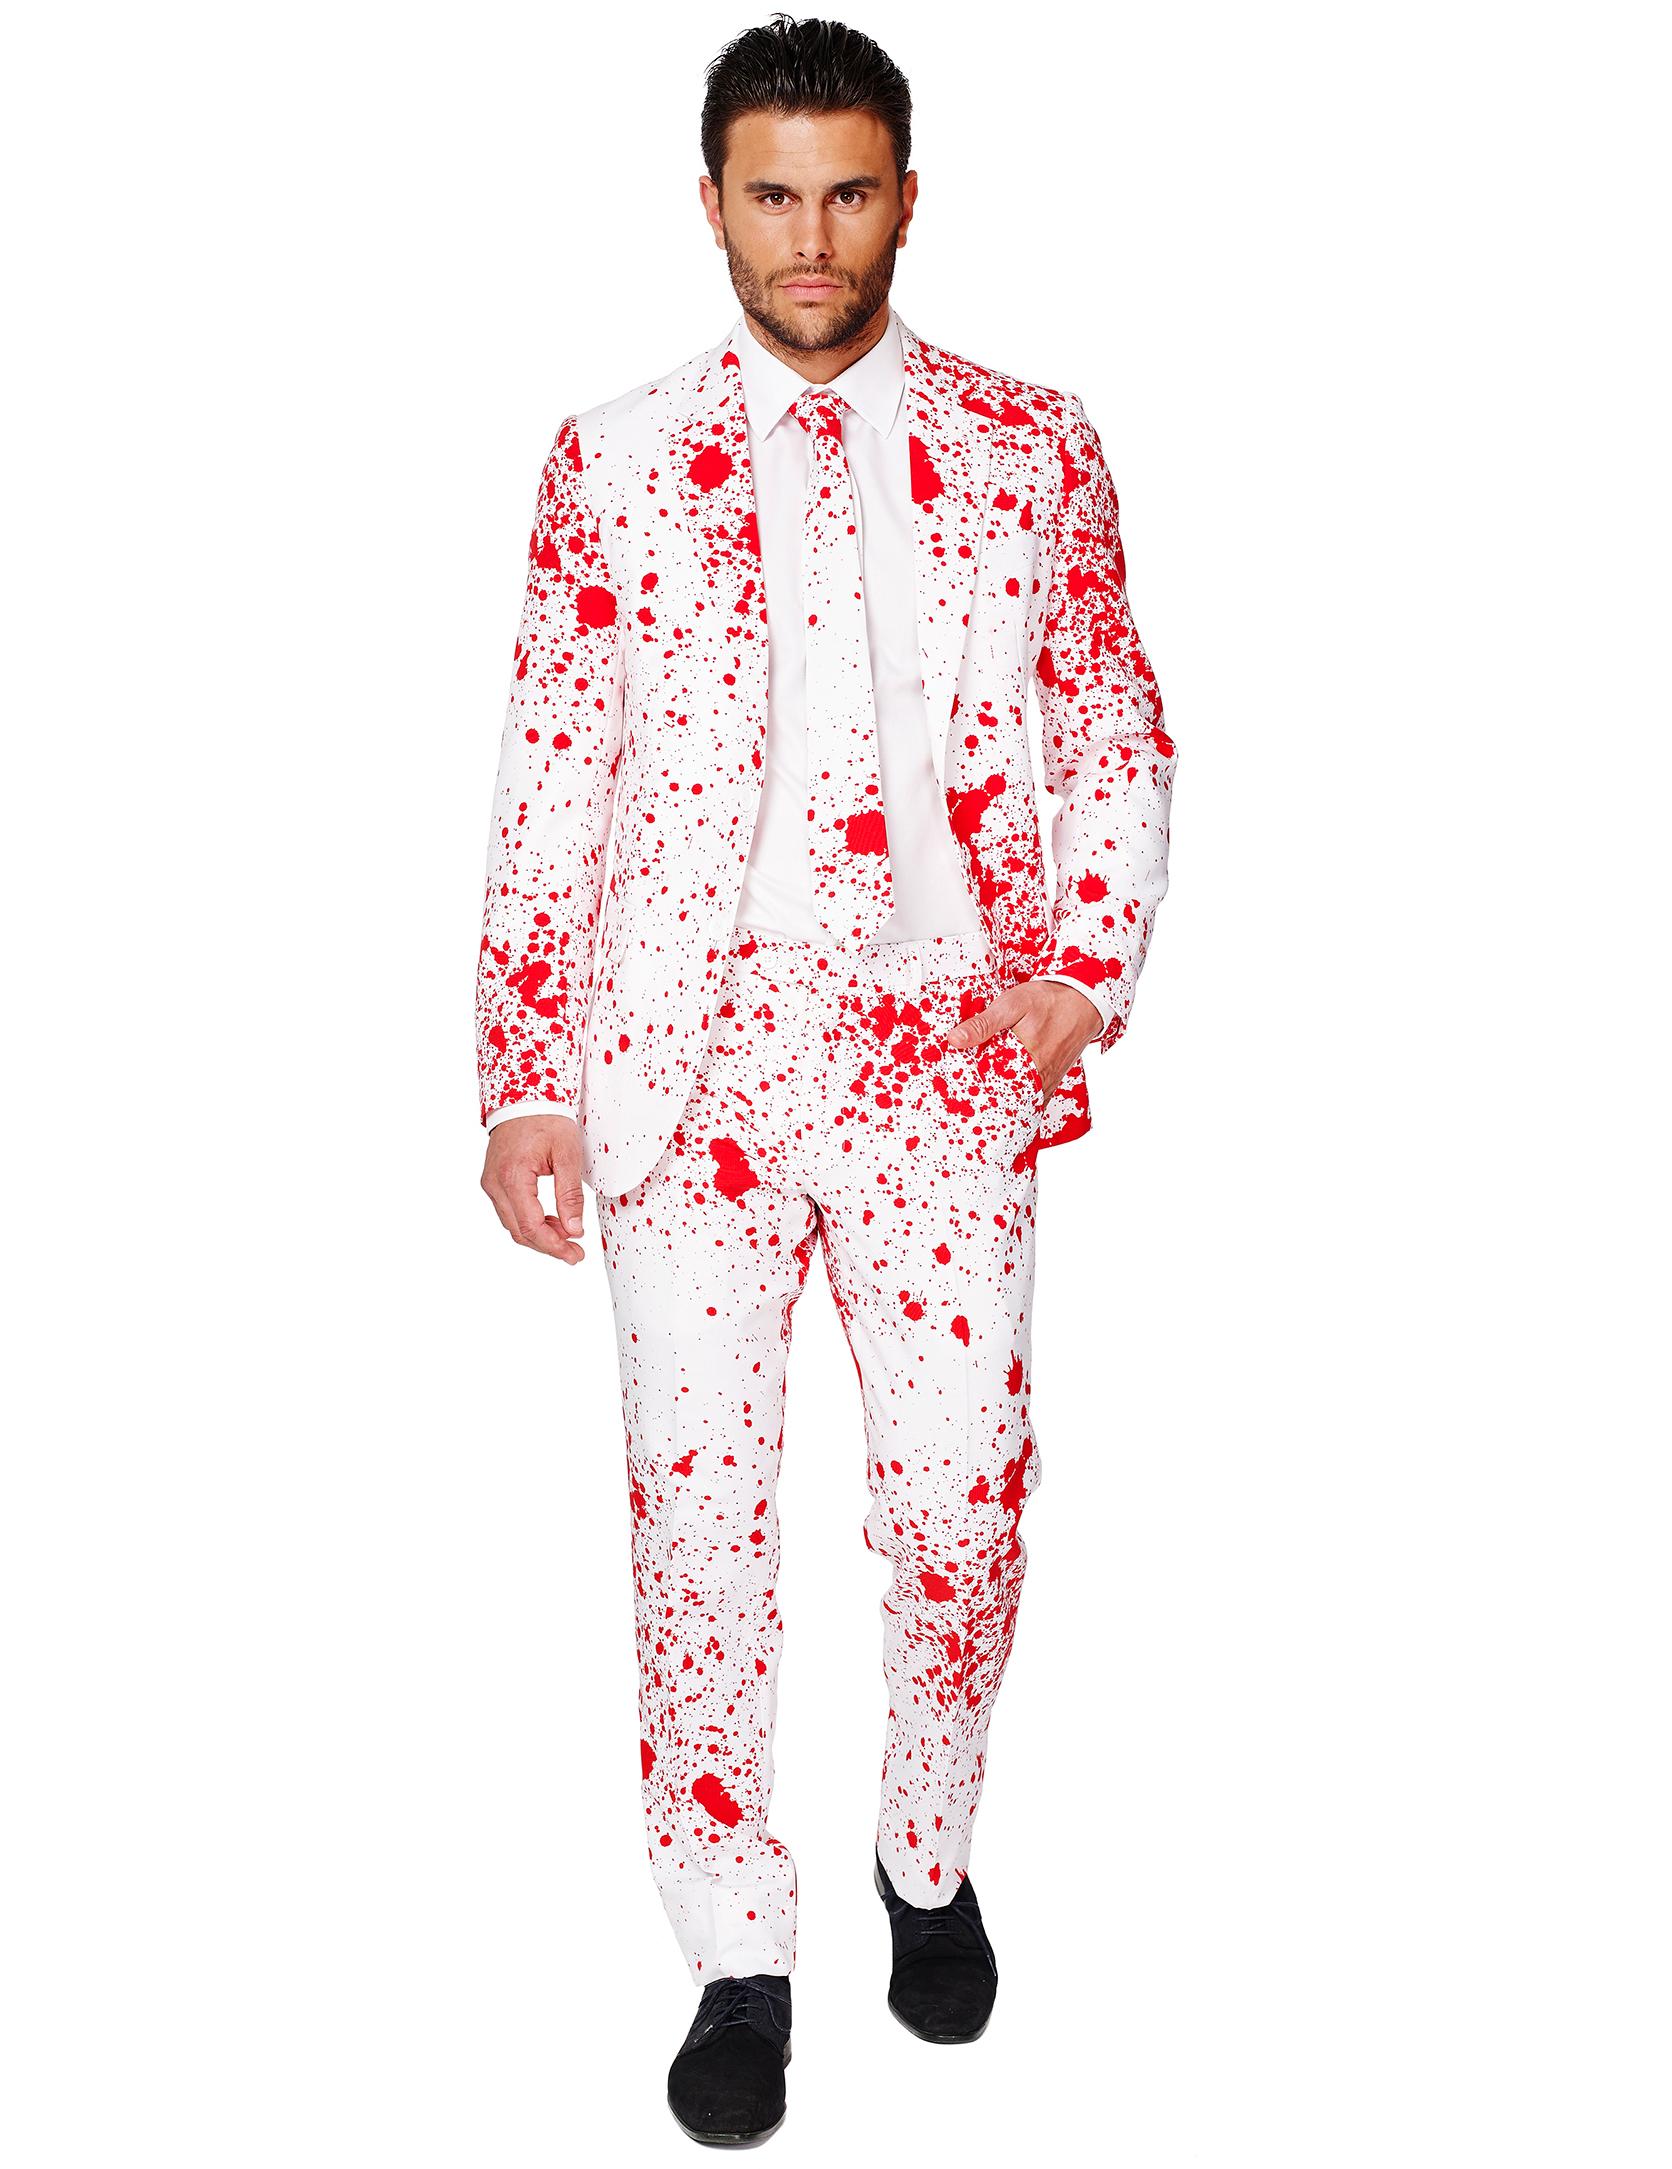 blutiger halloween opposuit anzug weiss rot g nstige faschings kost me bei karneval megastore. Black Bedroom Furniture Sets. Home Design Ideas